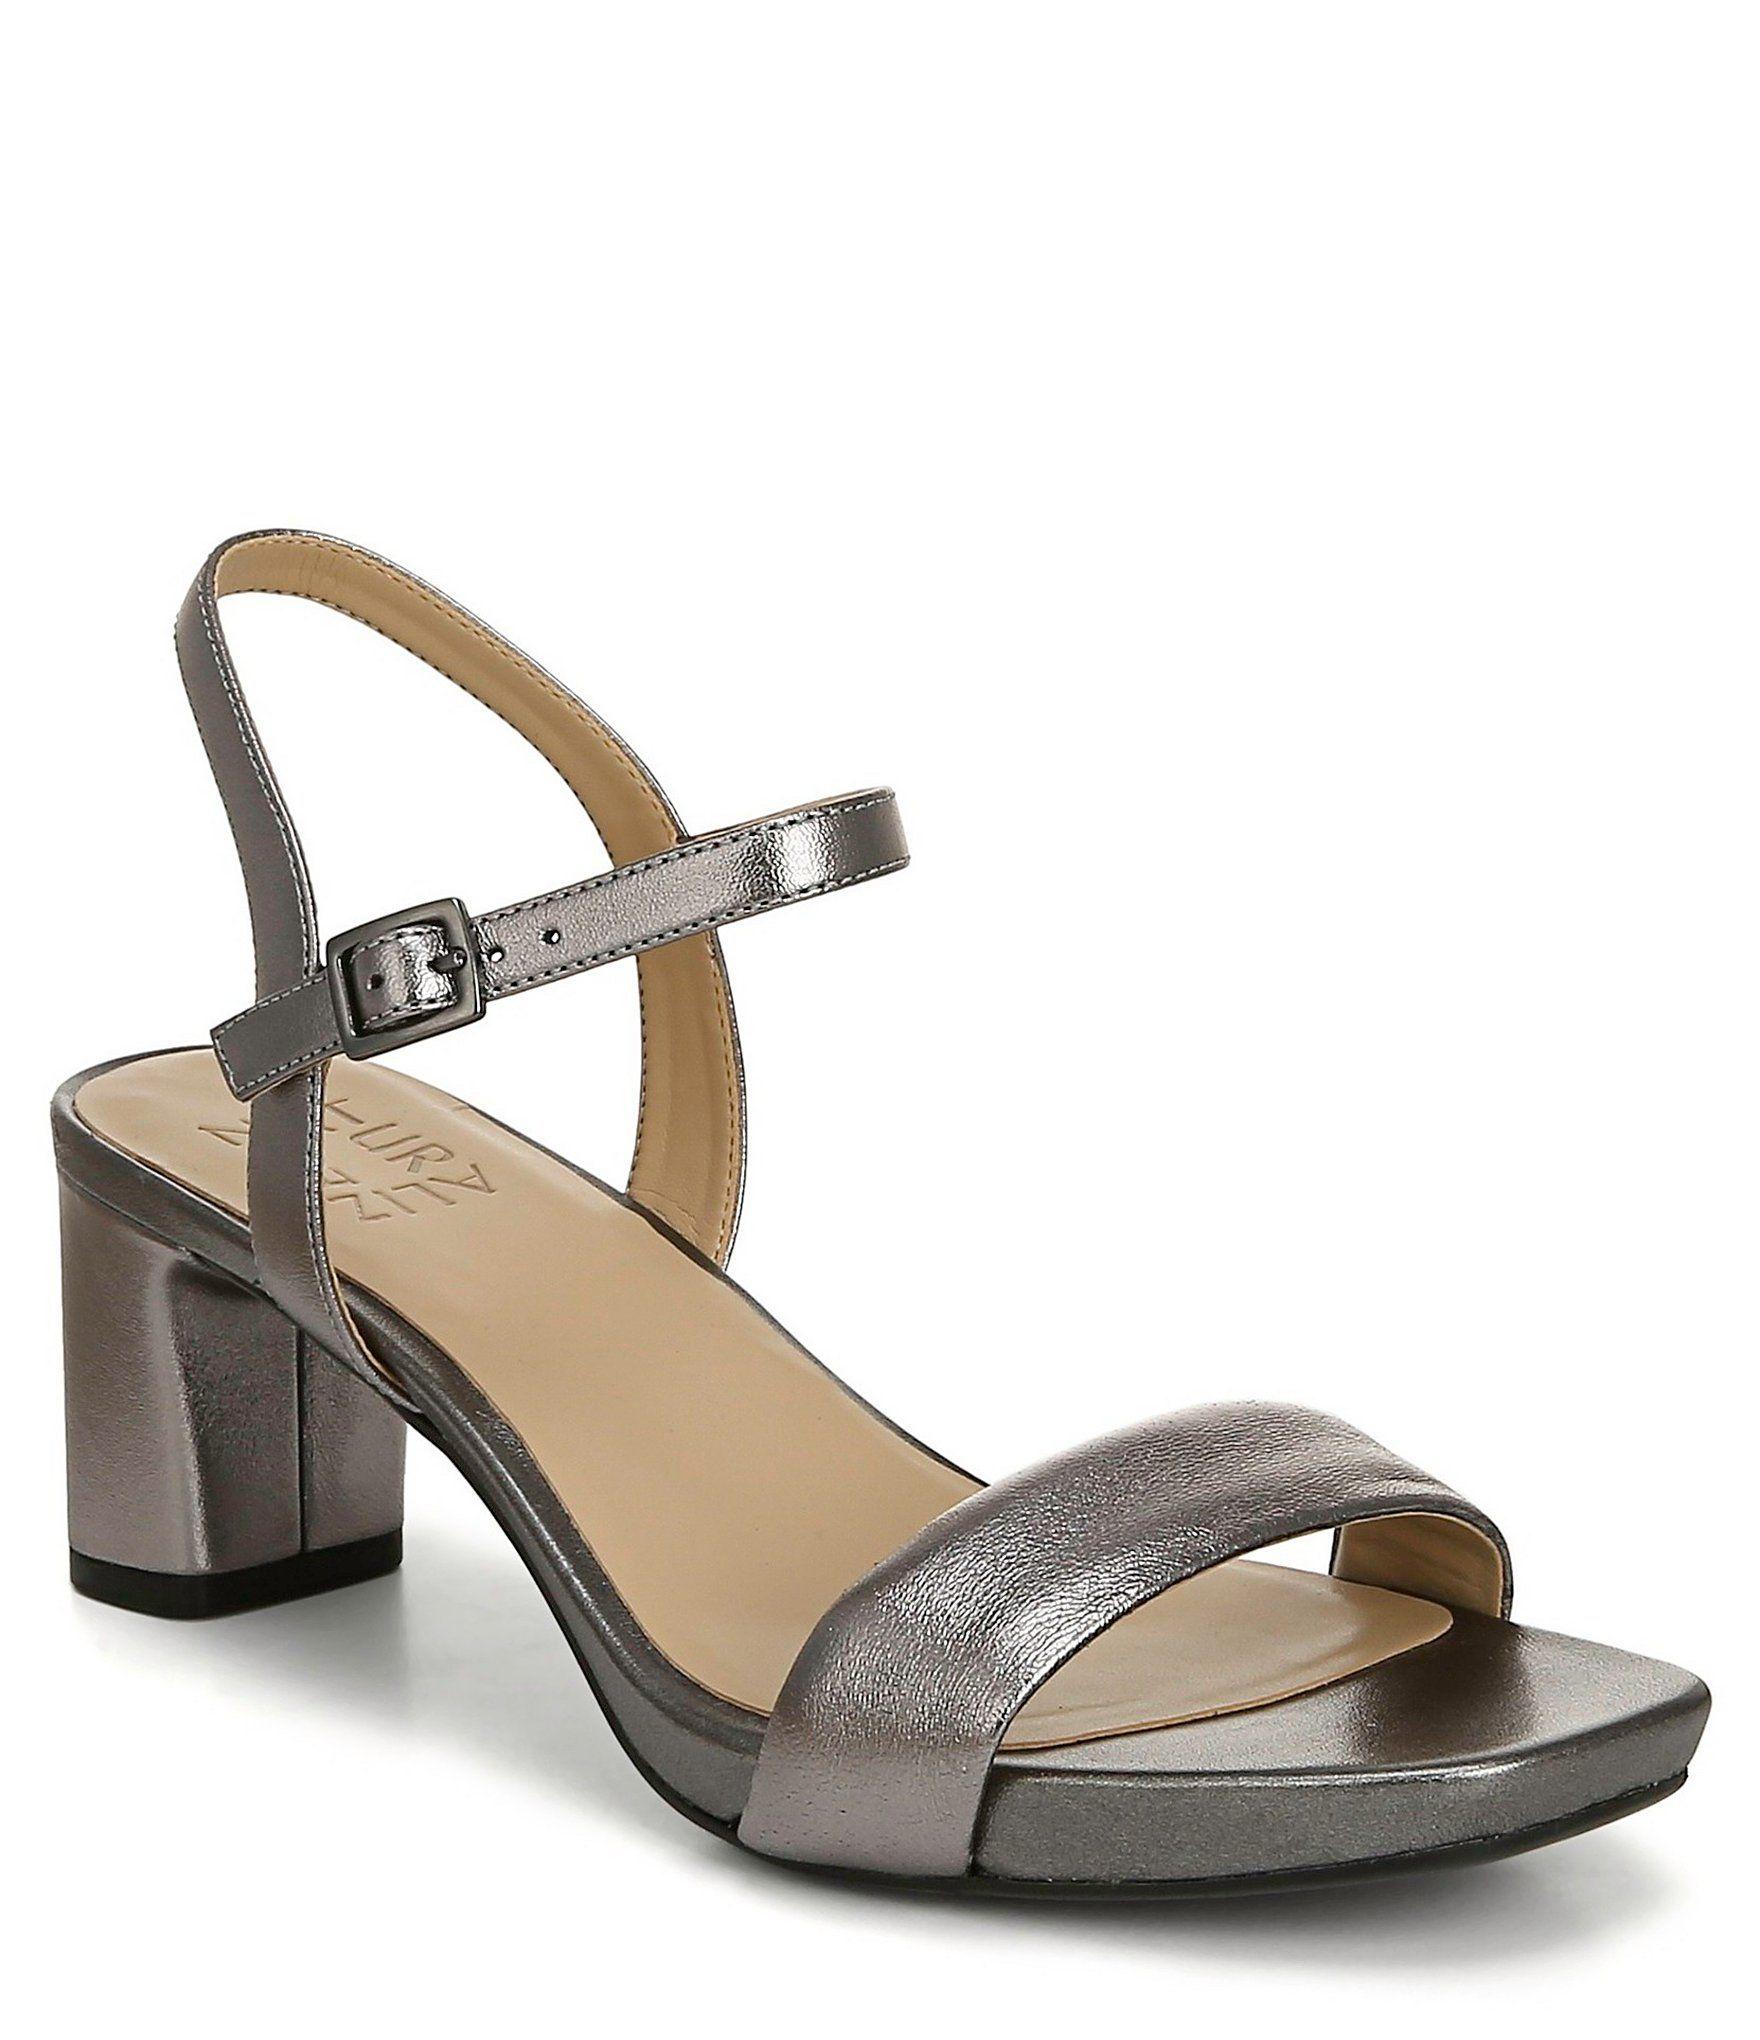 Photo of Naturalizer Ivy Leather Dress Sandals | Dillard's